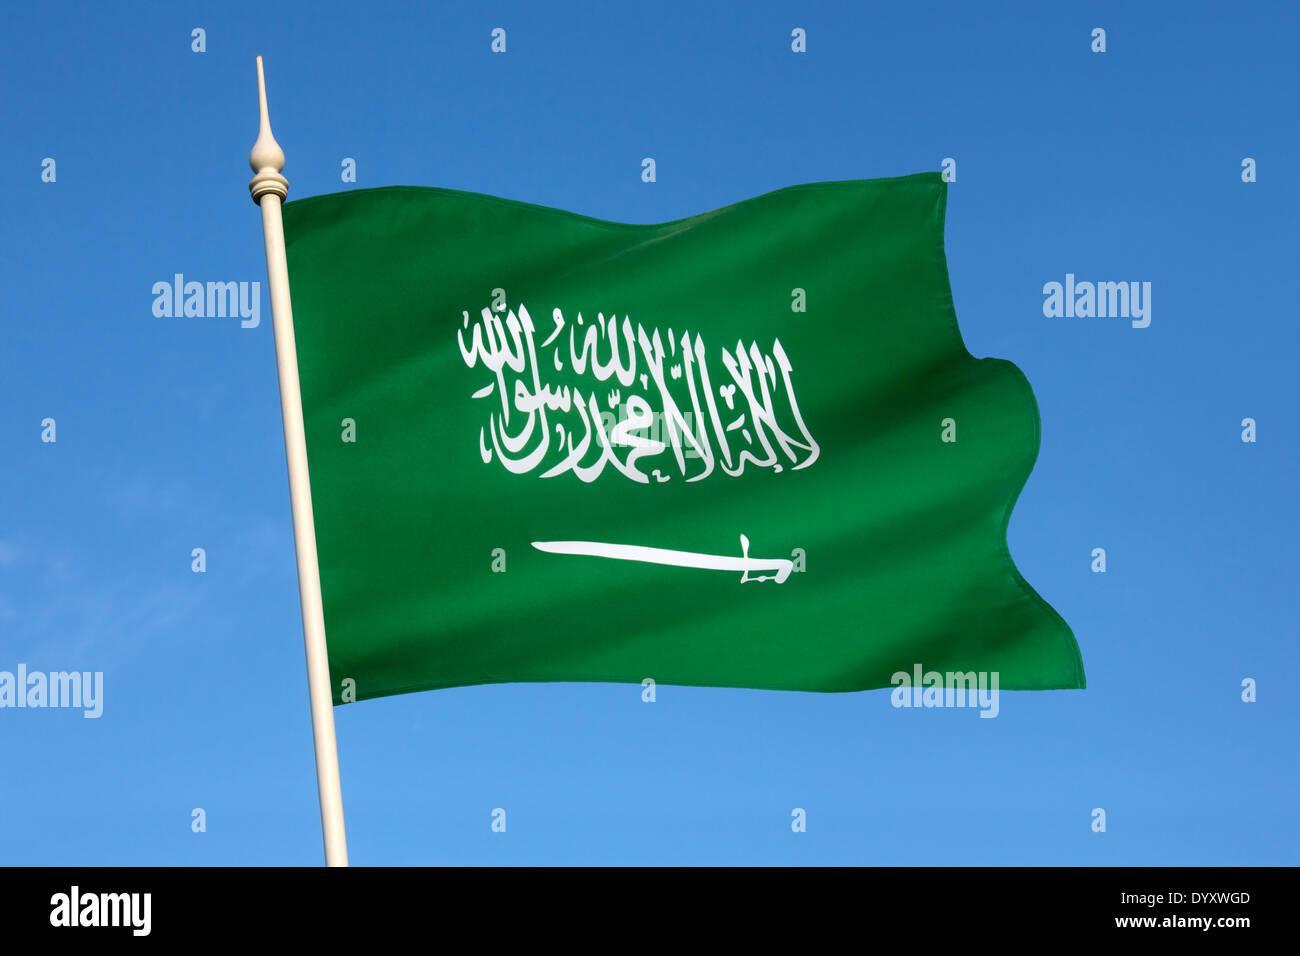 La bandera de Arabia Saudita Imagen De Stock